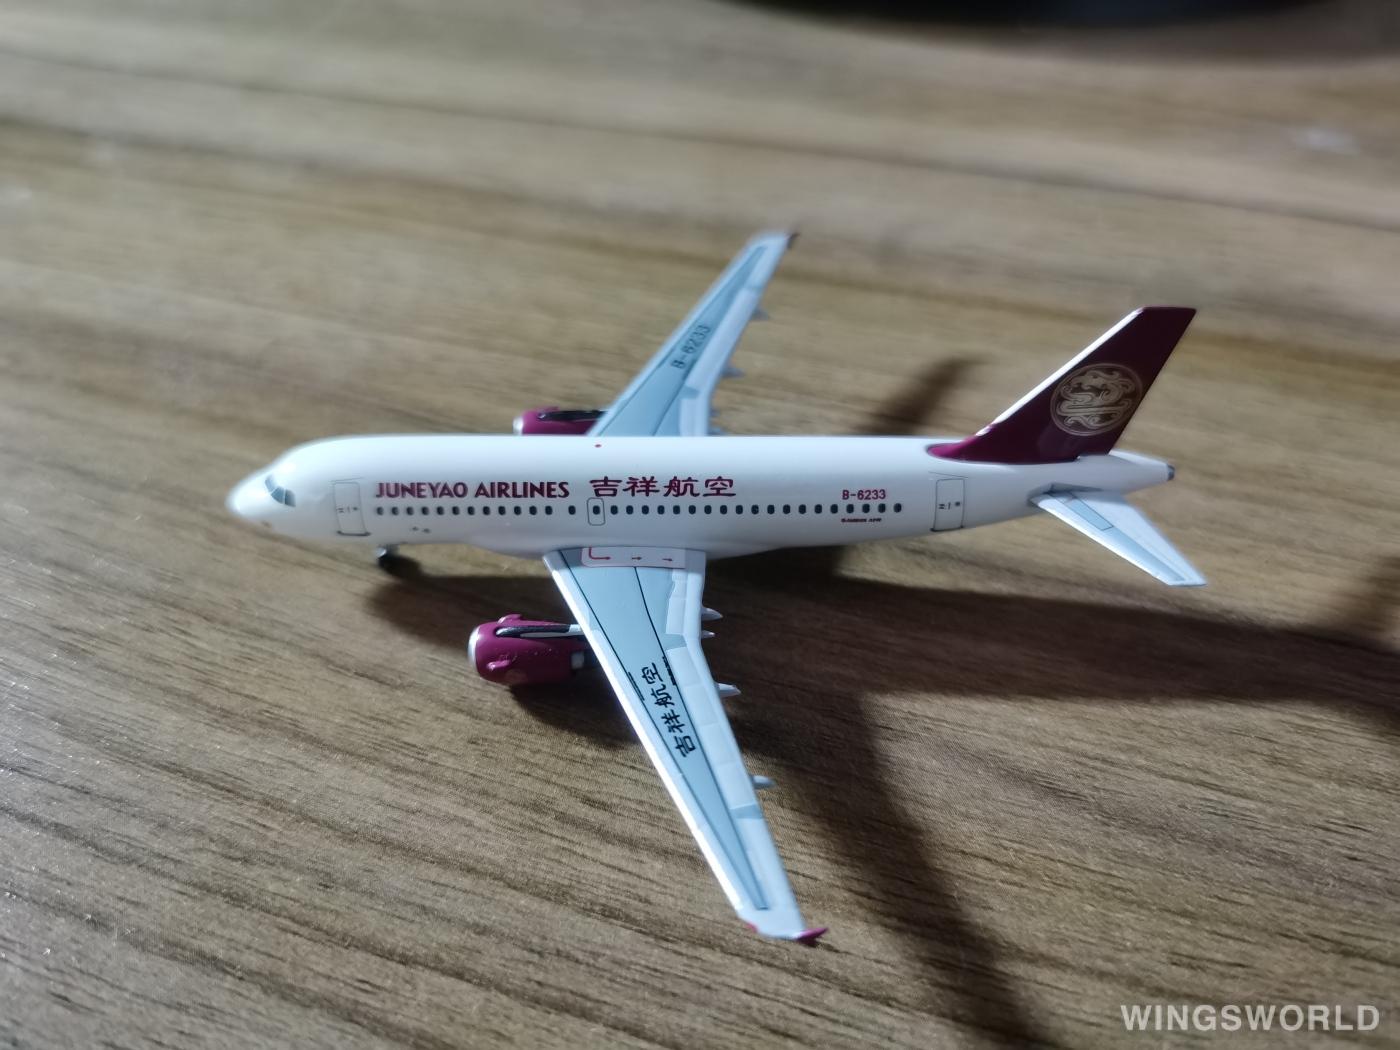 AeroClassics 1:400 ACB6233 Juneyao Airlines 吉祥航空 Airbus A319 B-6233